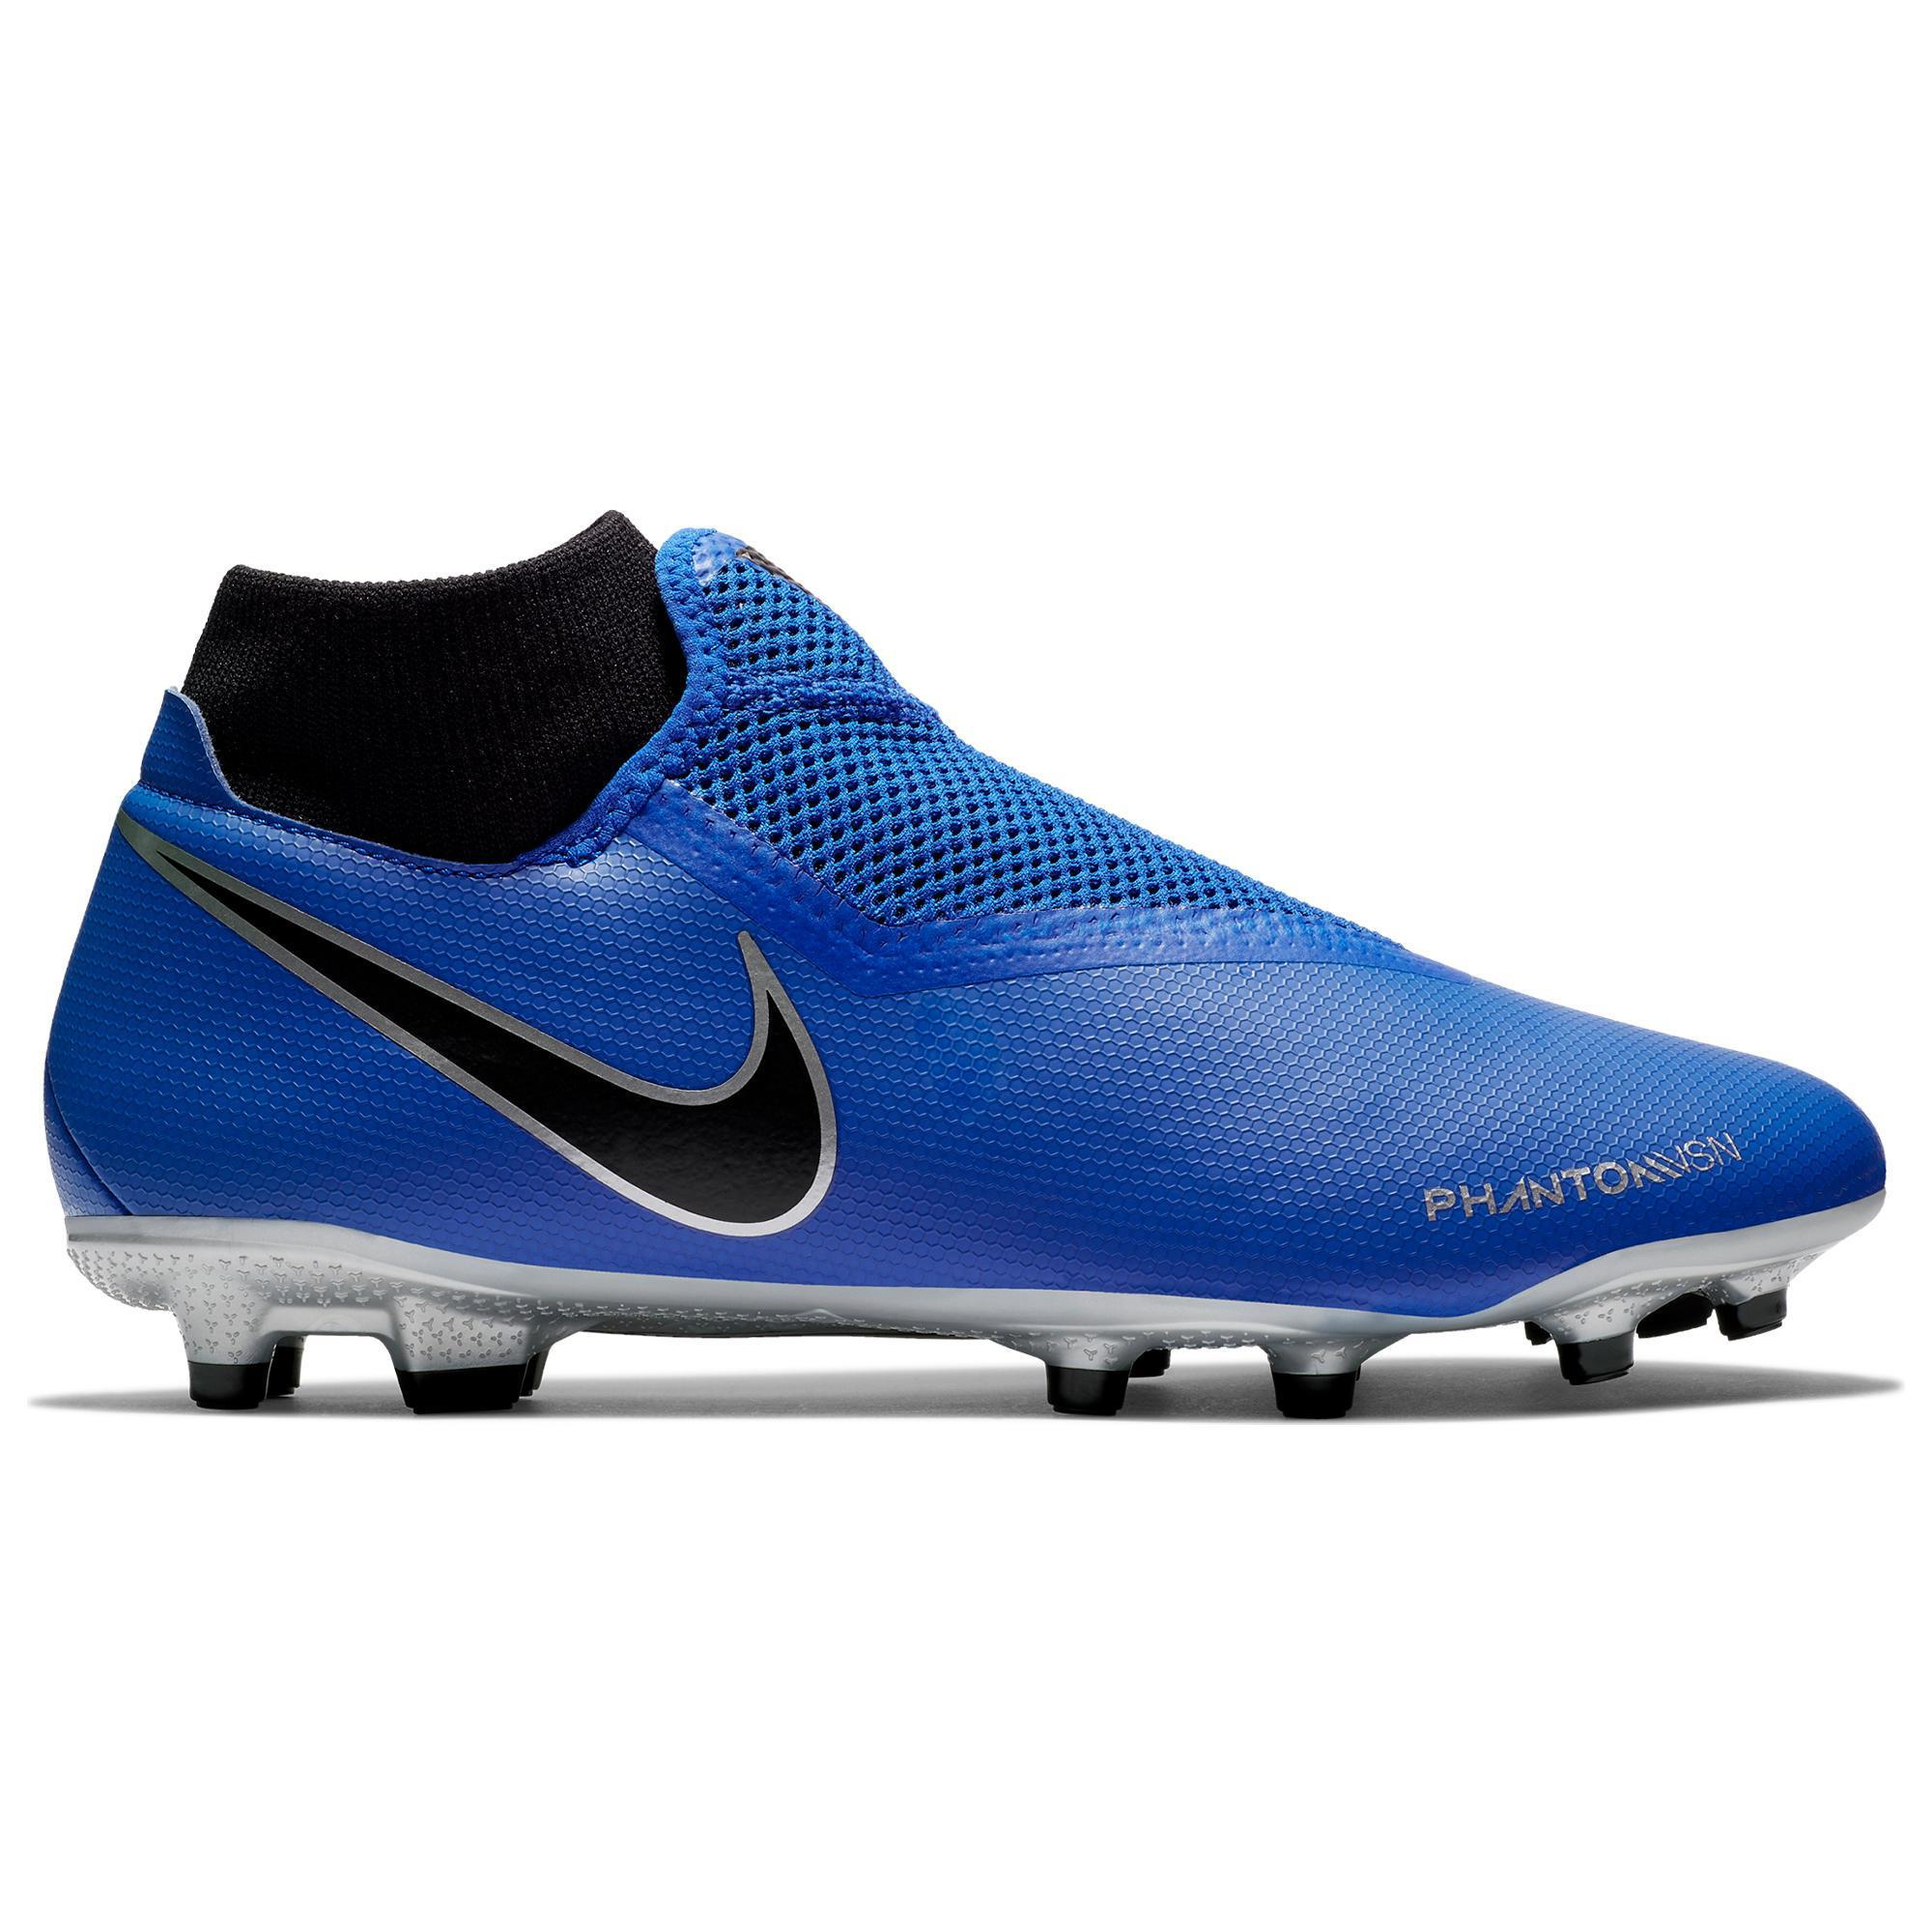 Phantom vision academy df mg voetbalschoenen blauw